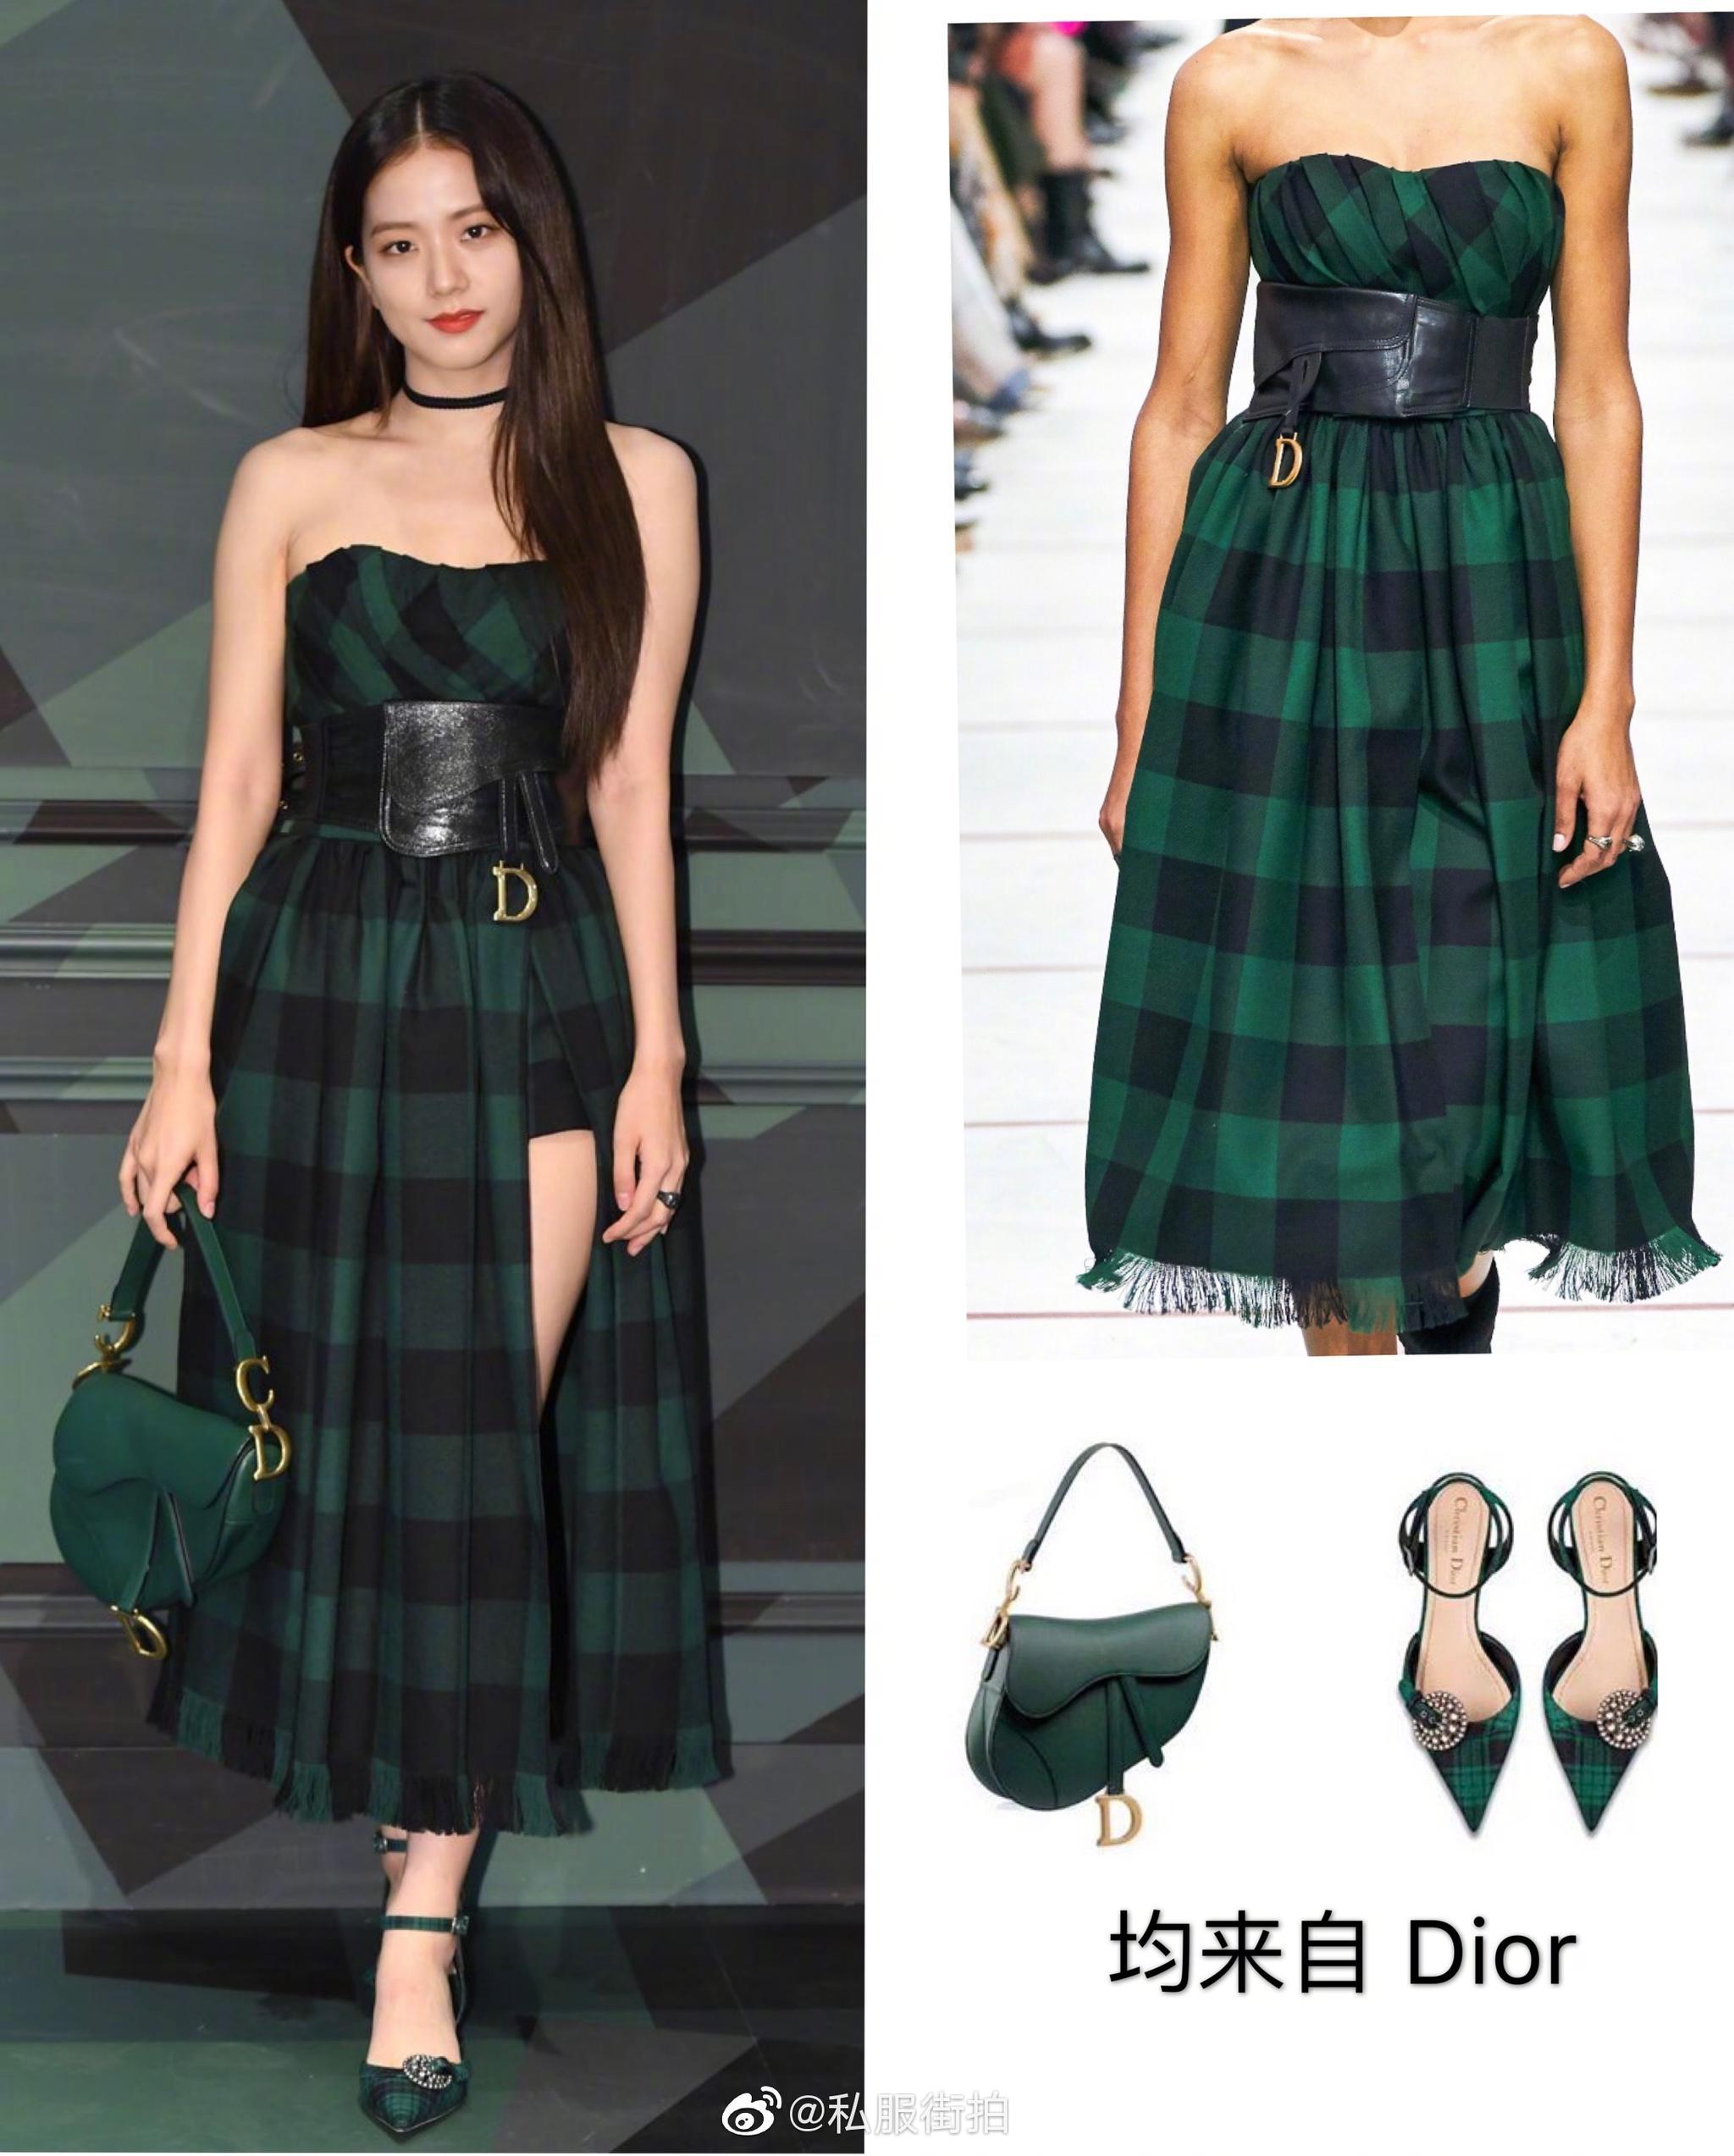 Blackpink组合成员JISOO格纹裙出席时尚活动,美貌令人窒息